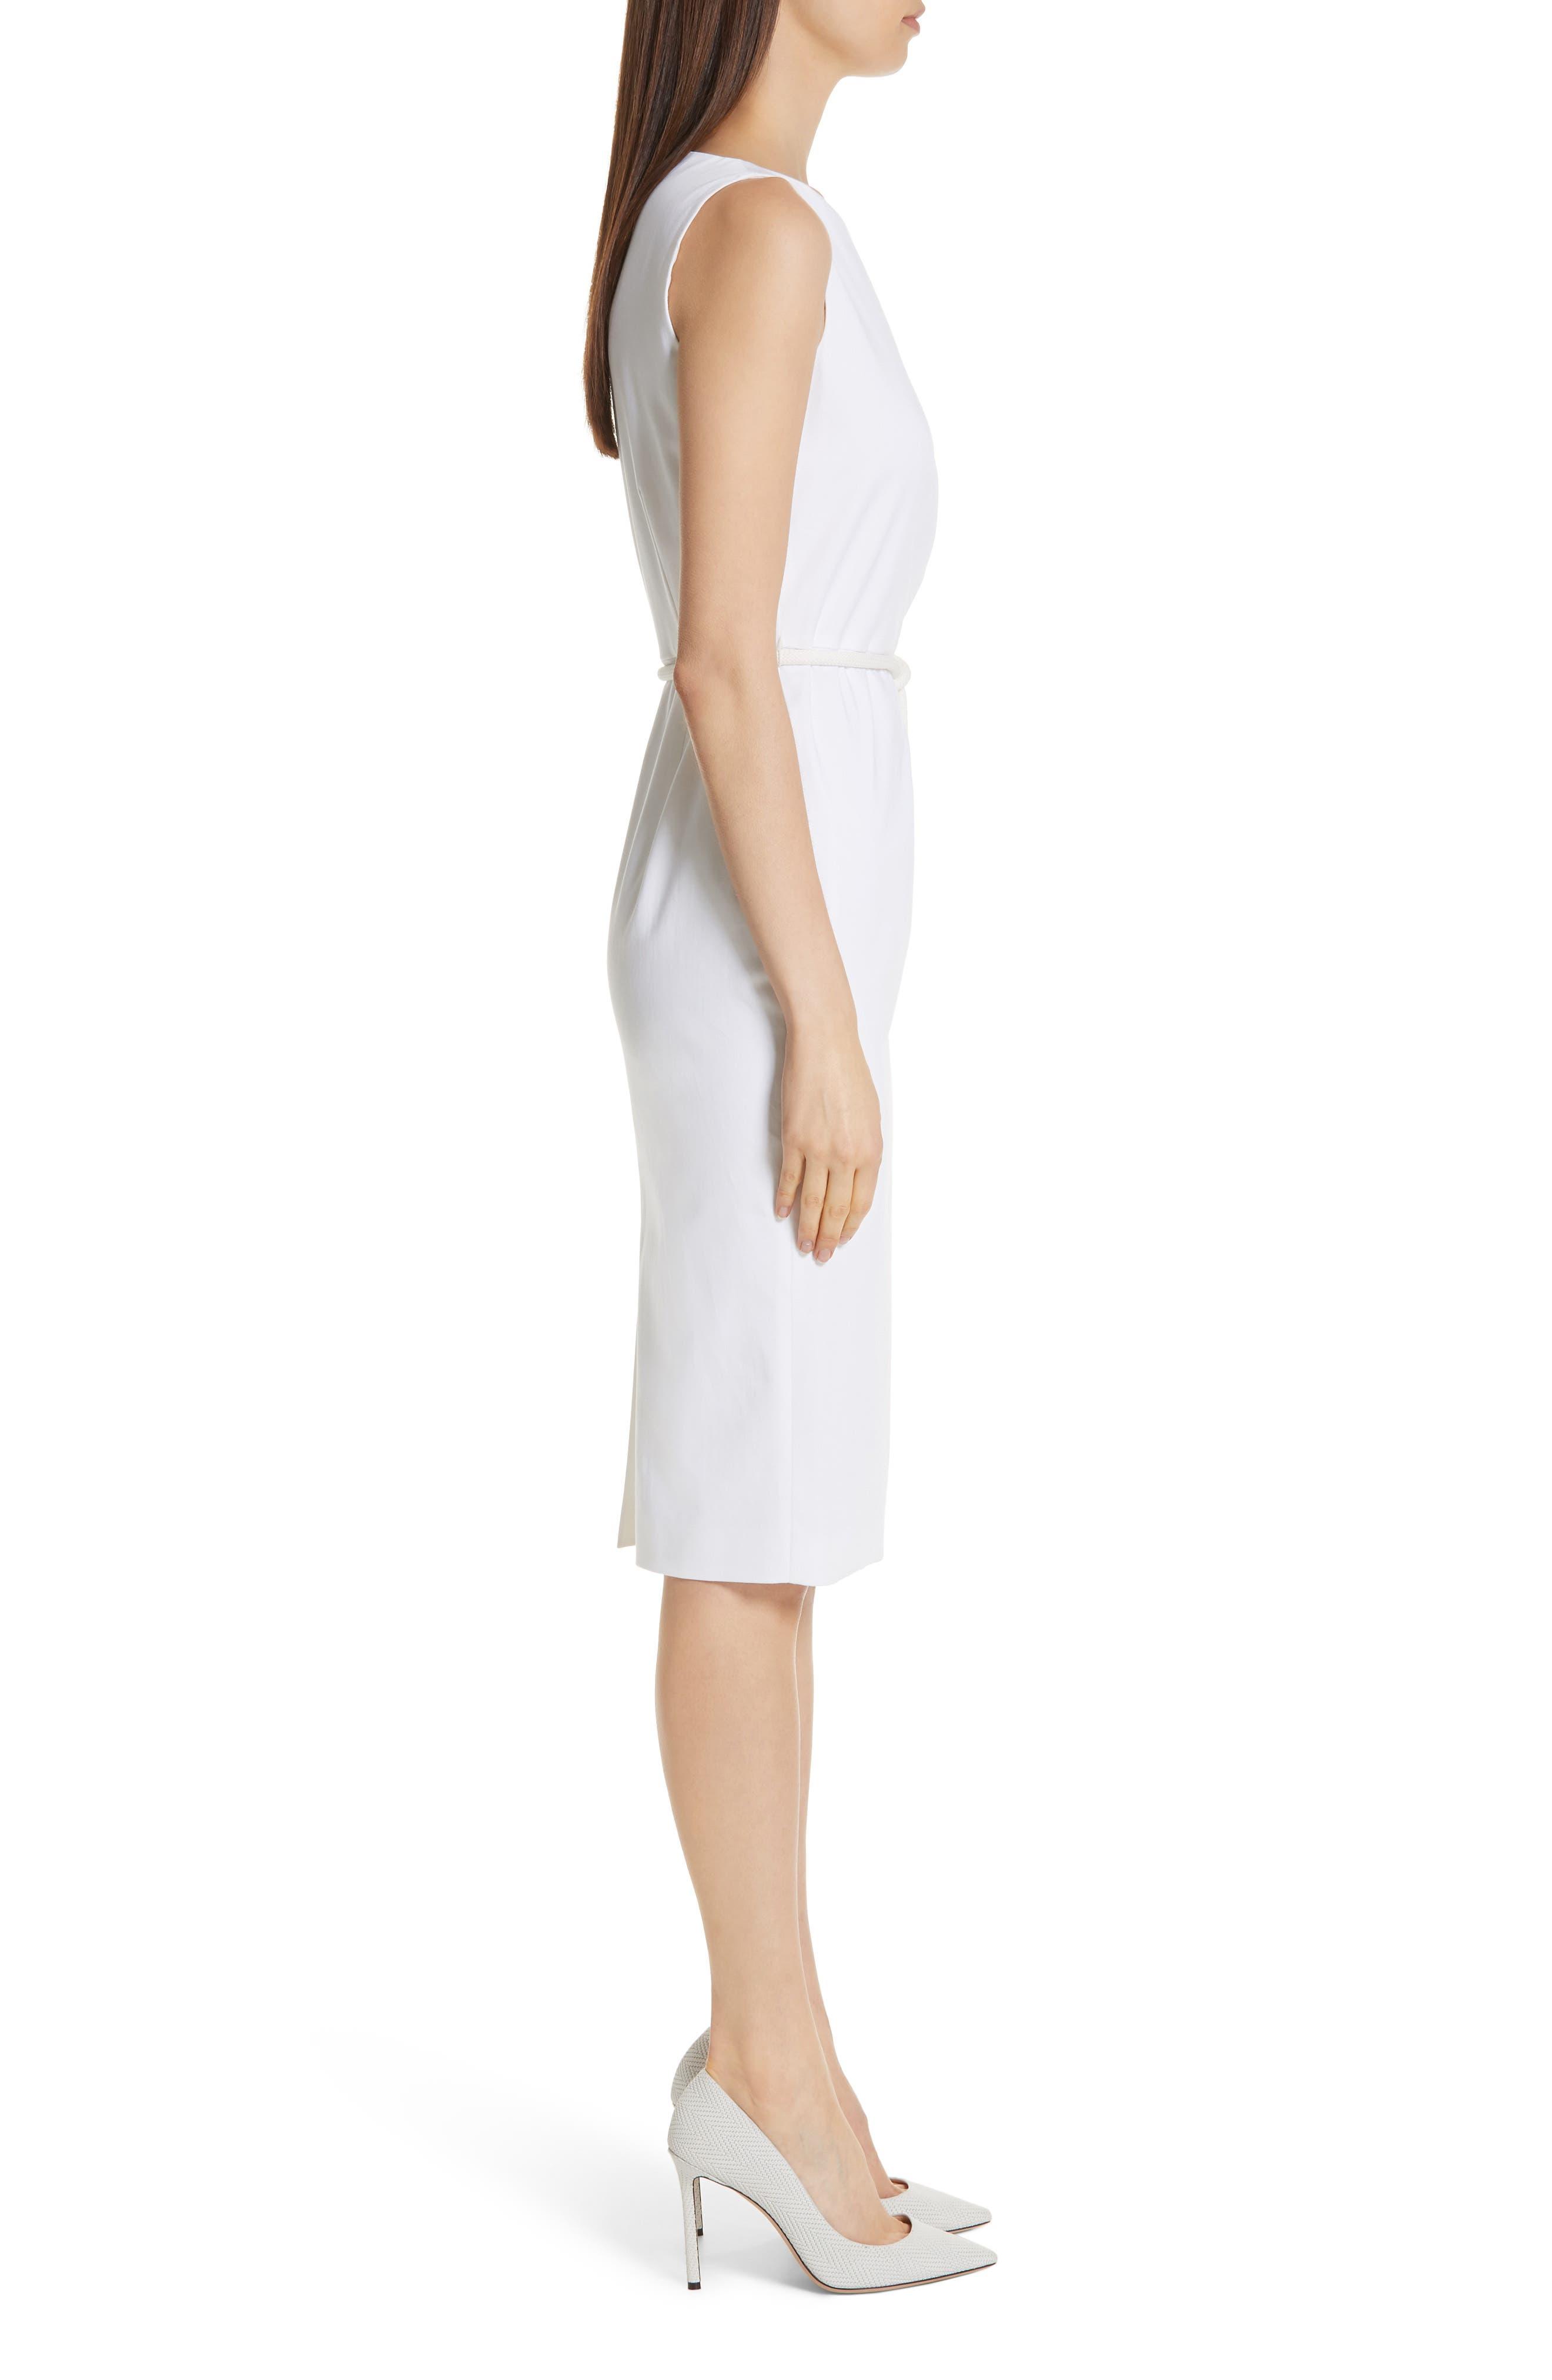 MAX MARA, Cordoba Sheath Dress, Alternate thumbnail 5, color, OPTICAL WHITE